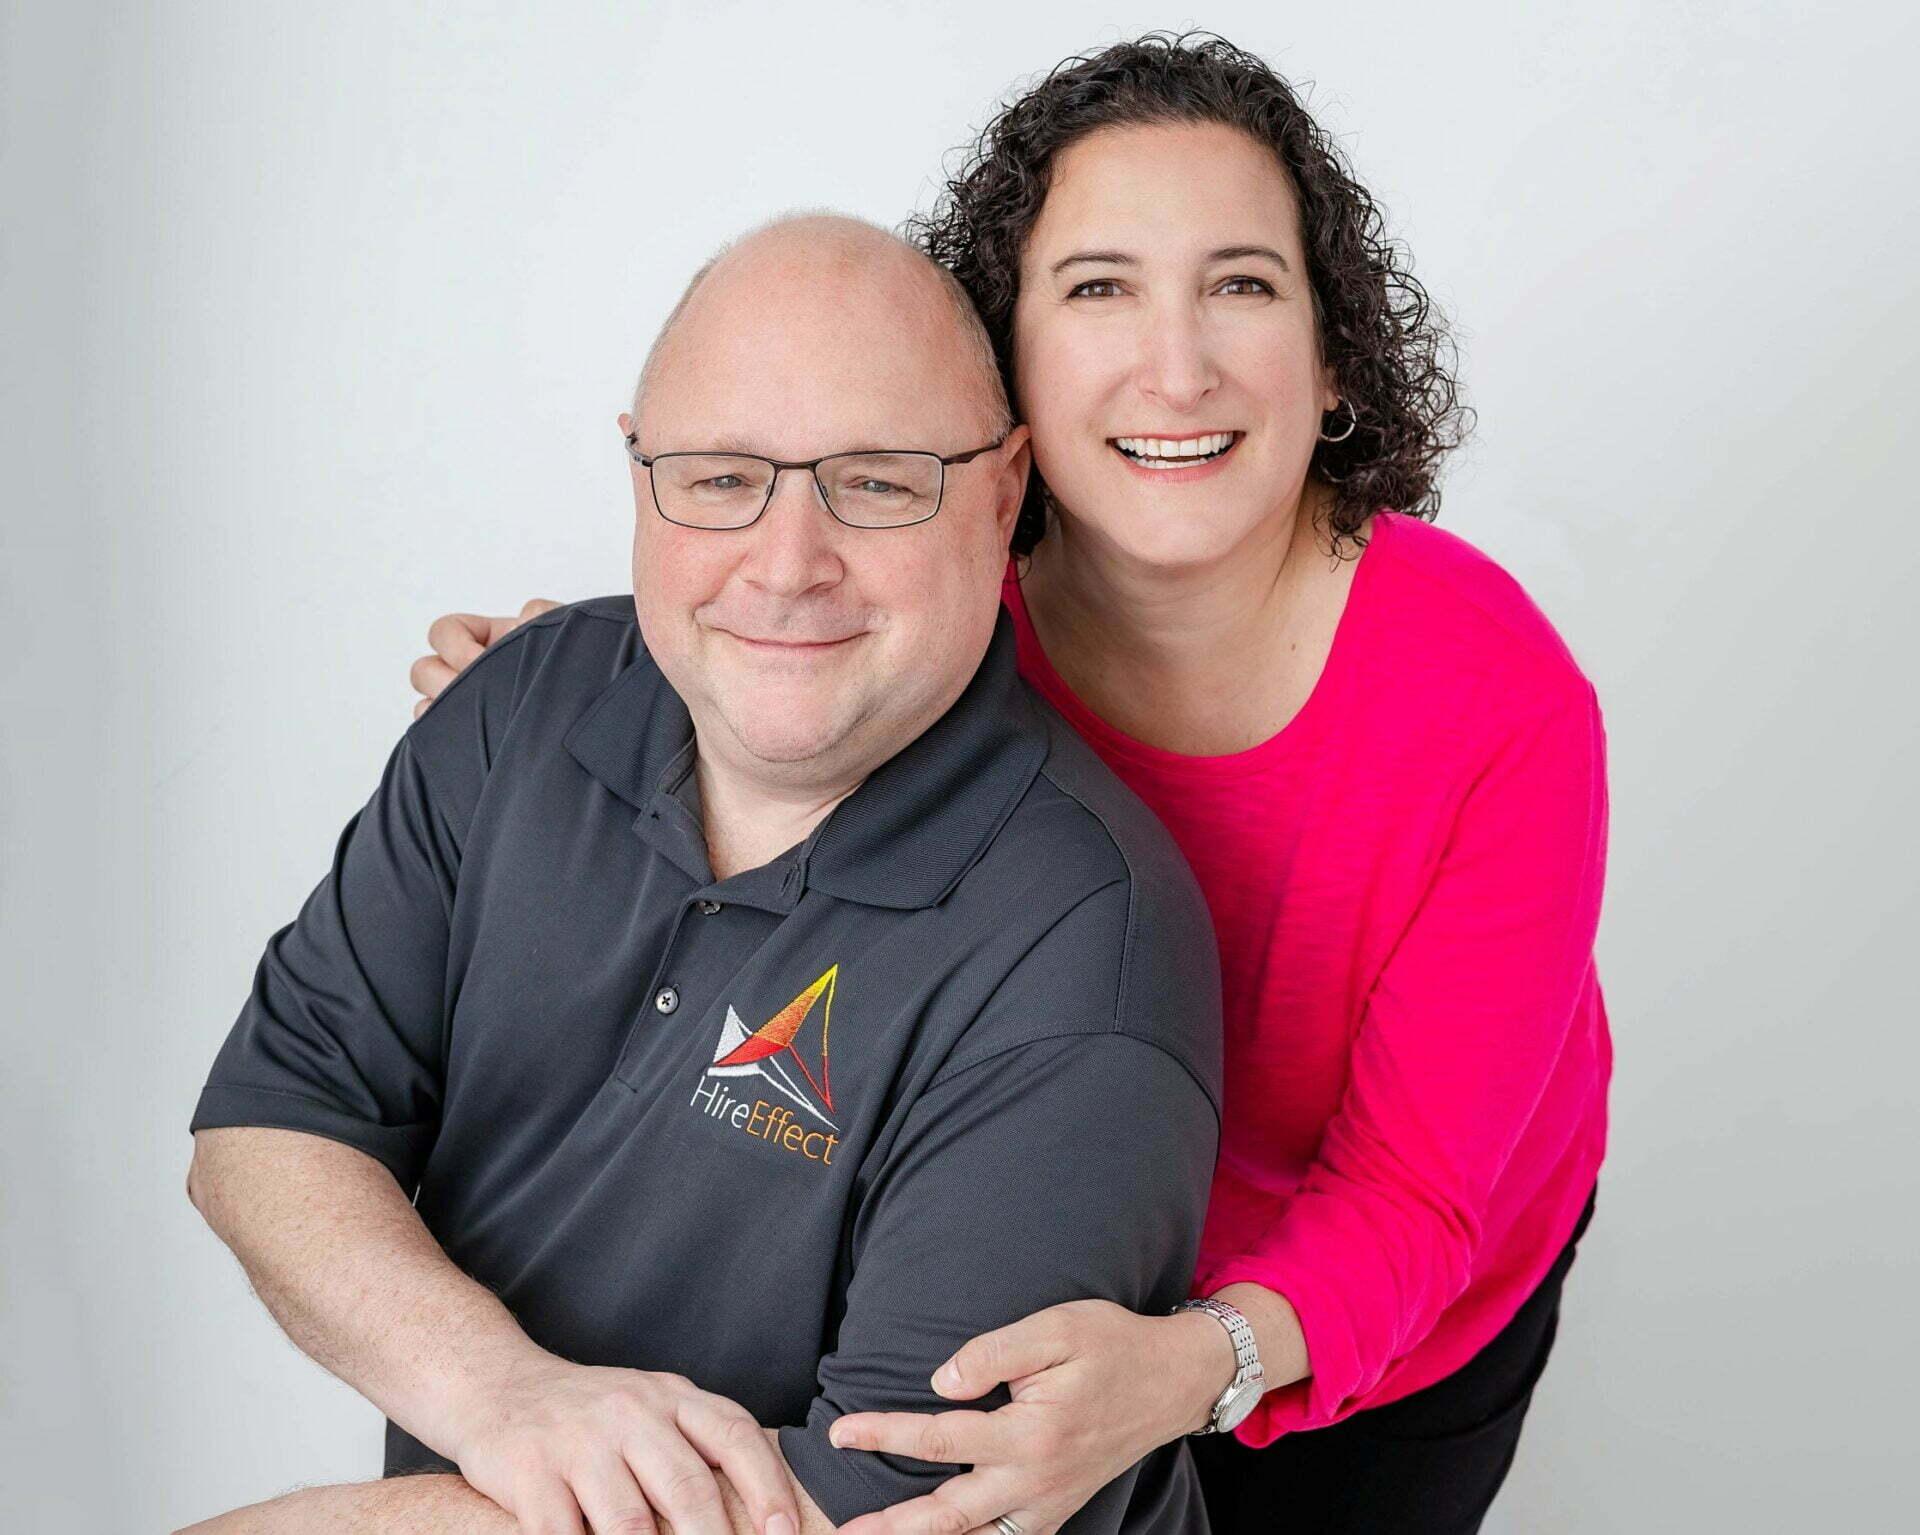 Jennifer & Chris Scott - Owners of HireEffect